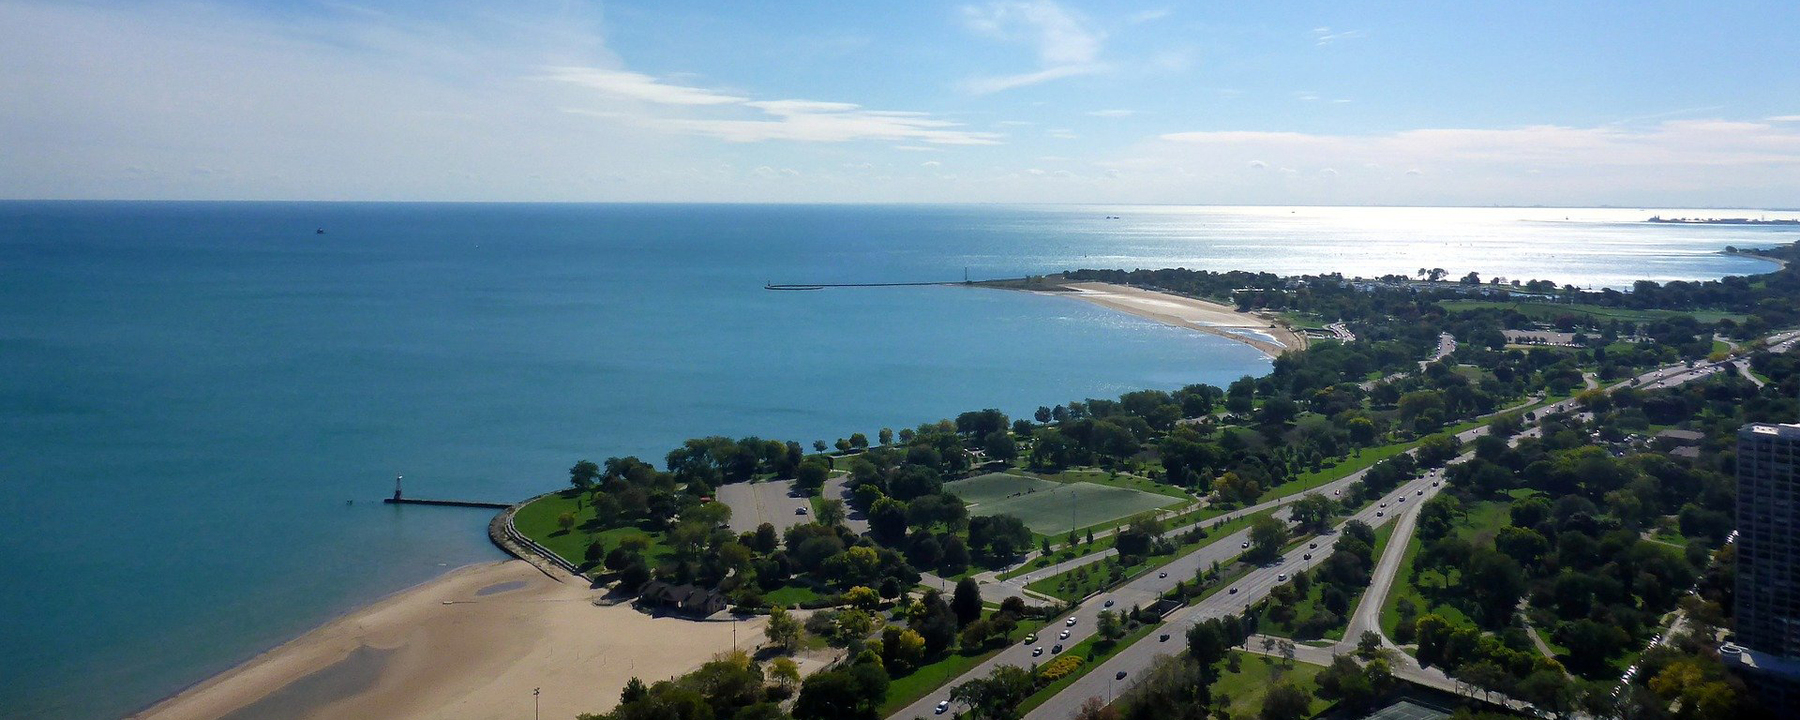 Lake Michigan Chicago shoreline